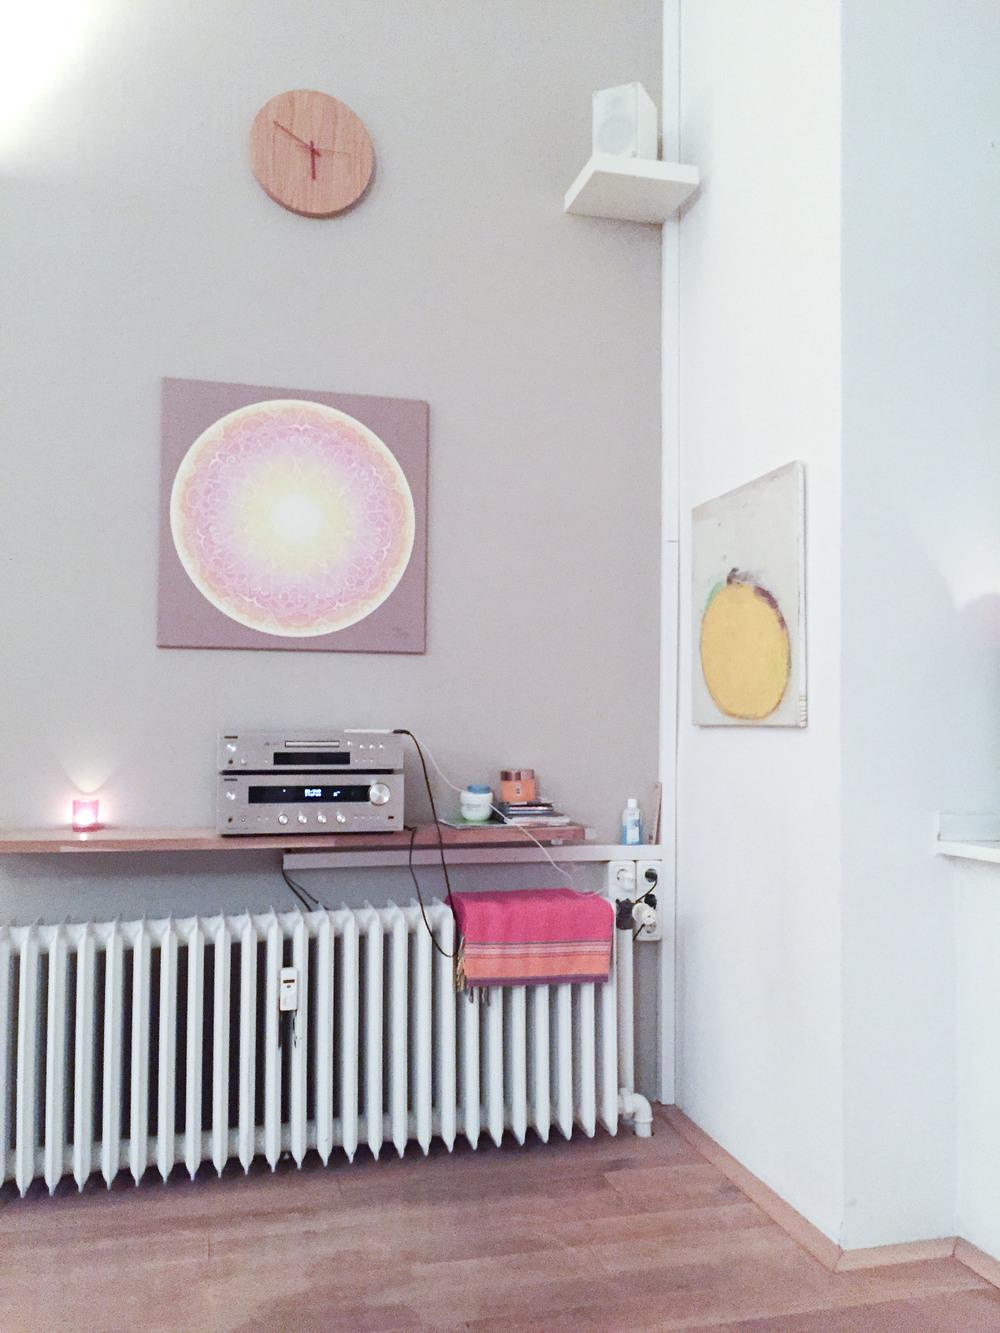 studio 78 pilates Yoga Hamburg Eimsbüttel3935.jpg